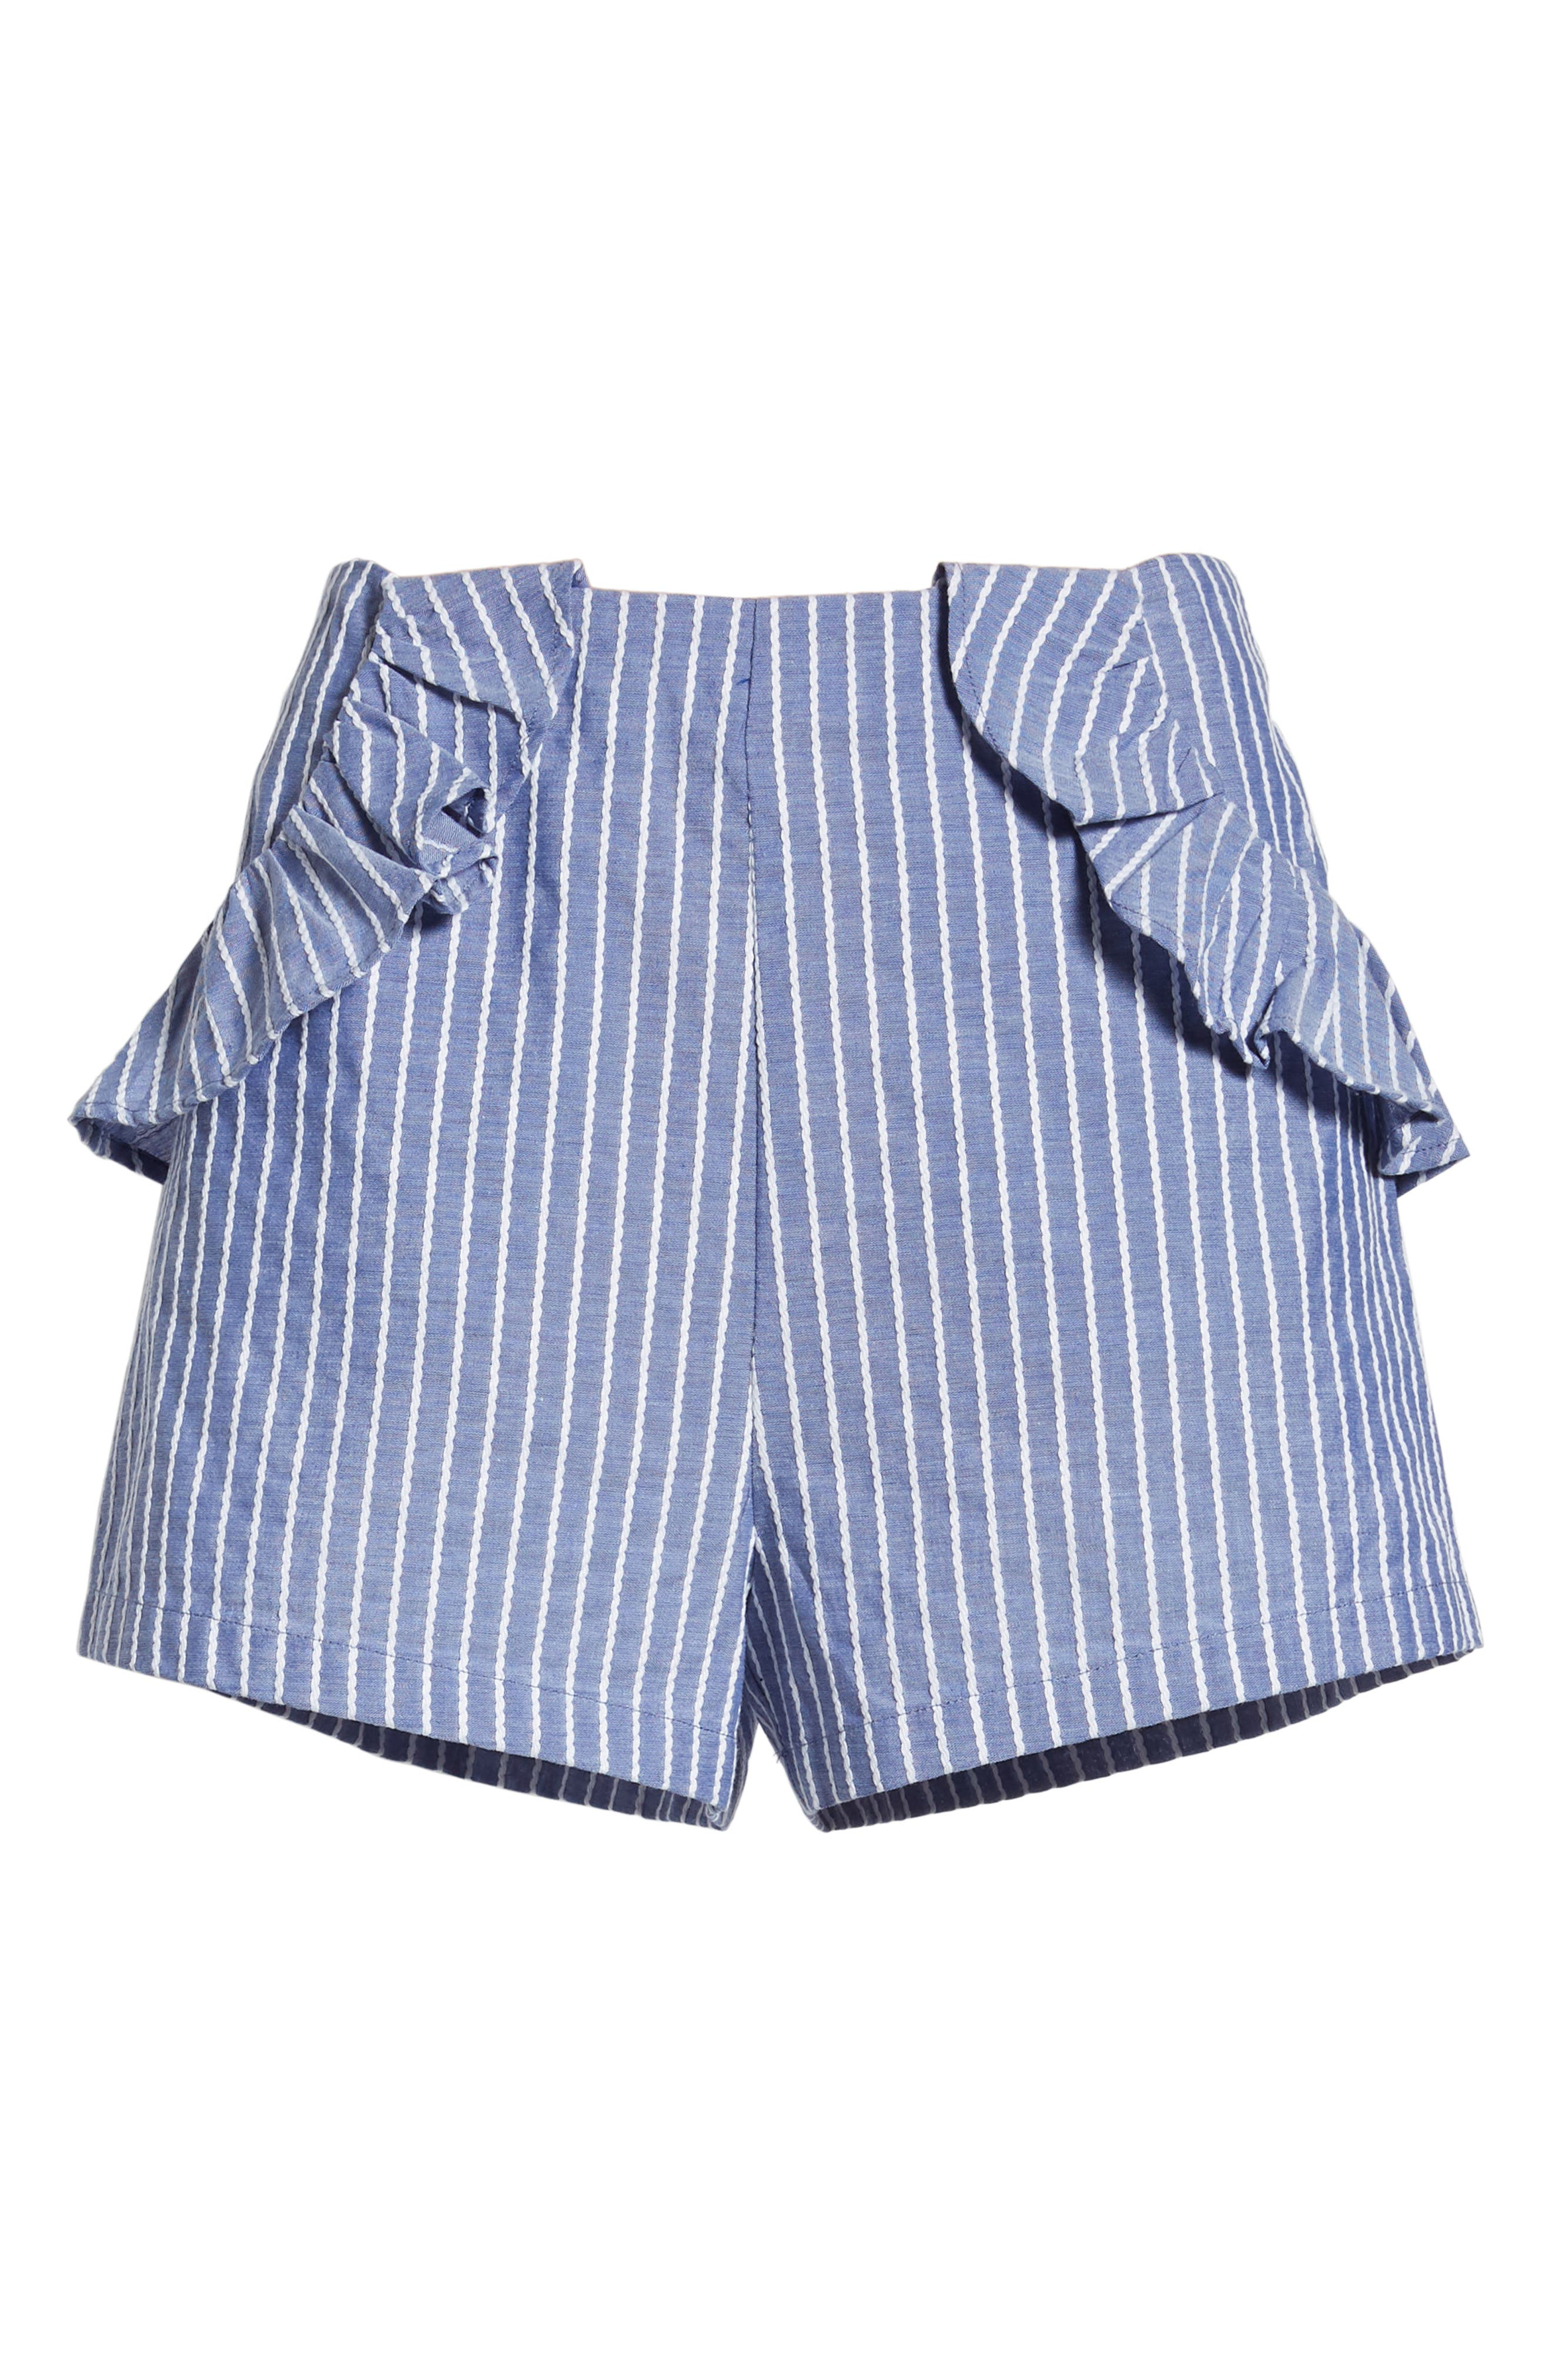 Parcel Ruffle Detail Shorts,                             Alternate thumbnail 6, color,                             400